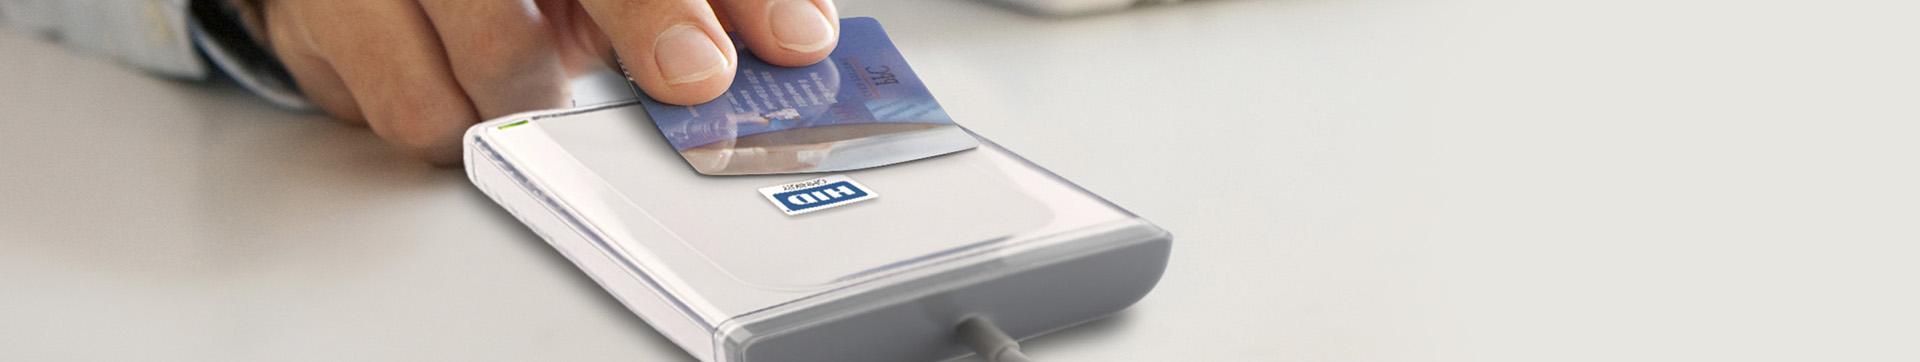 HID OMNIKEY Card Reader - YouCard